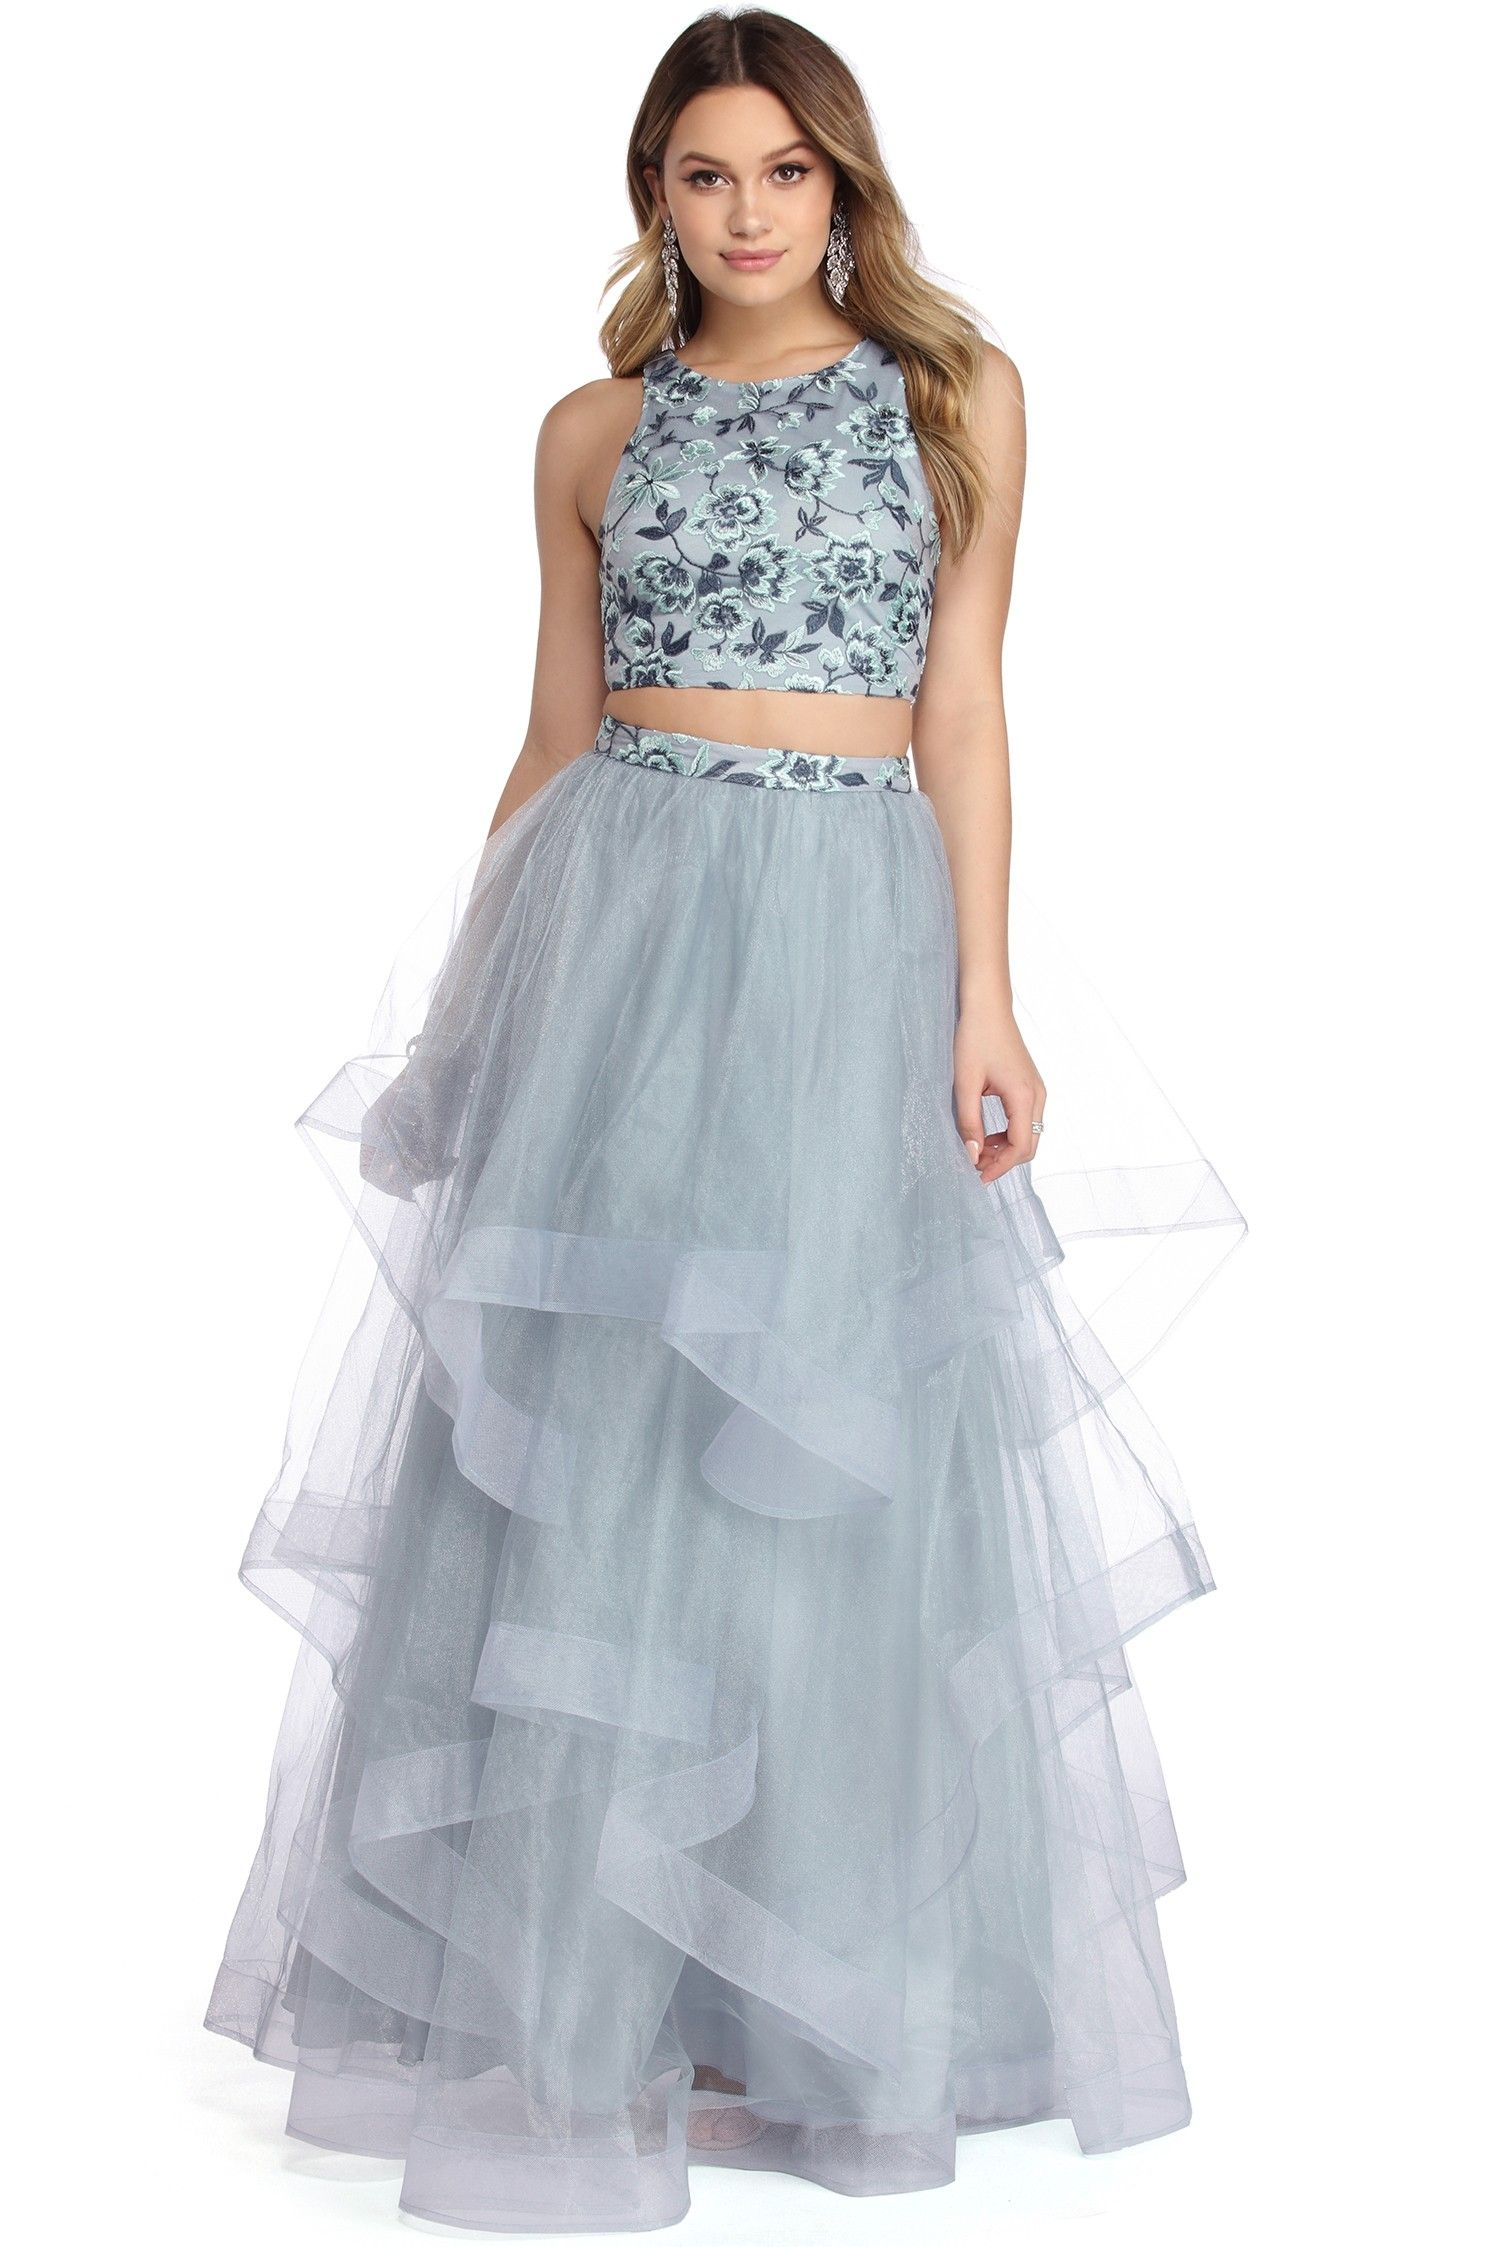 Final Sale Sienna Light Blue Tulle Two Piece Dress Two Piece Dress Womens Prom Dresses Prom Dresses [ 2247 x 1500 Pixel ]